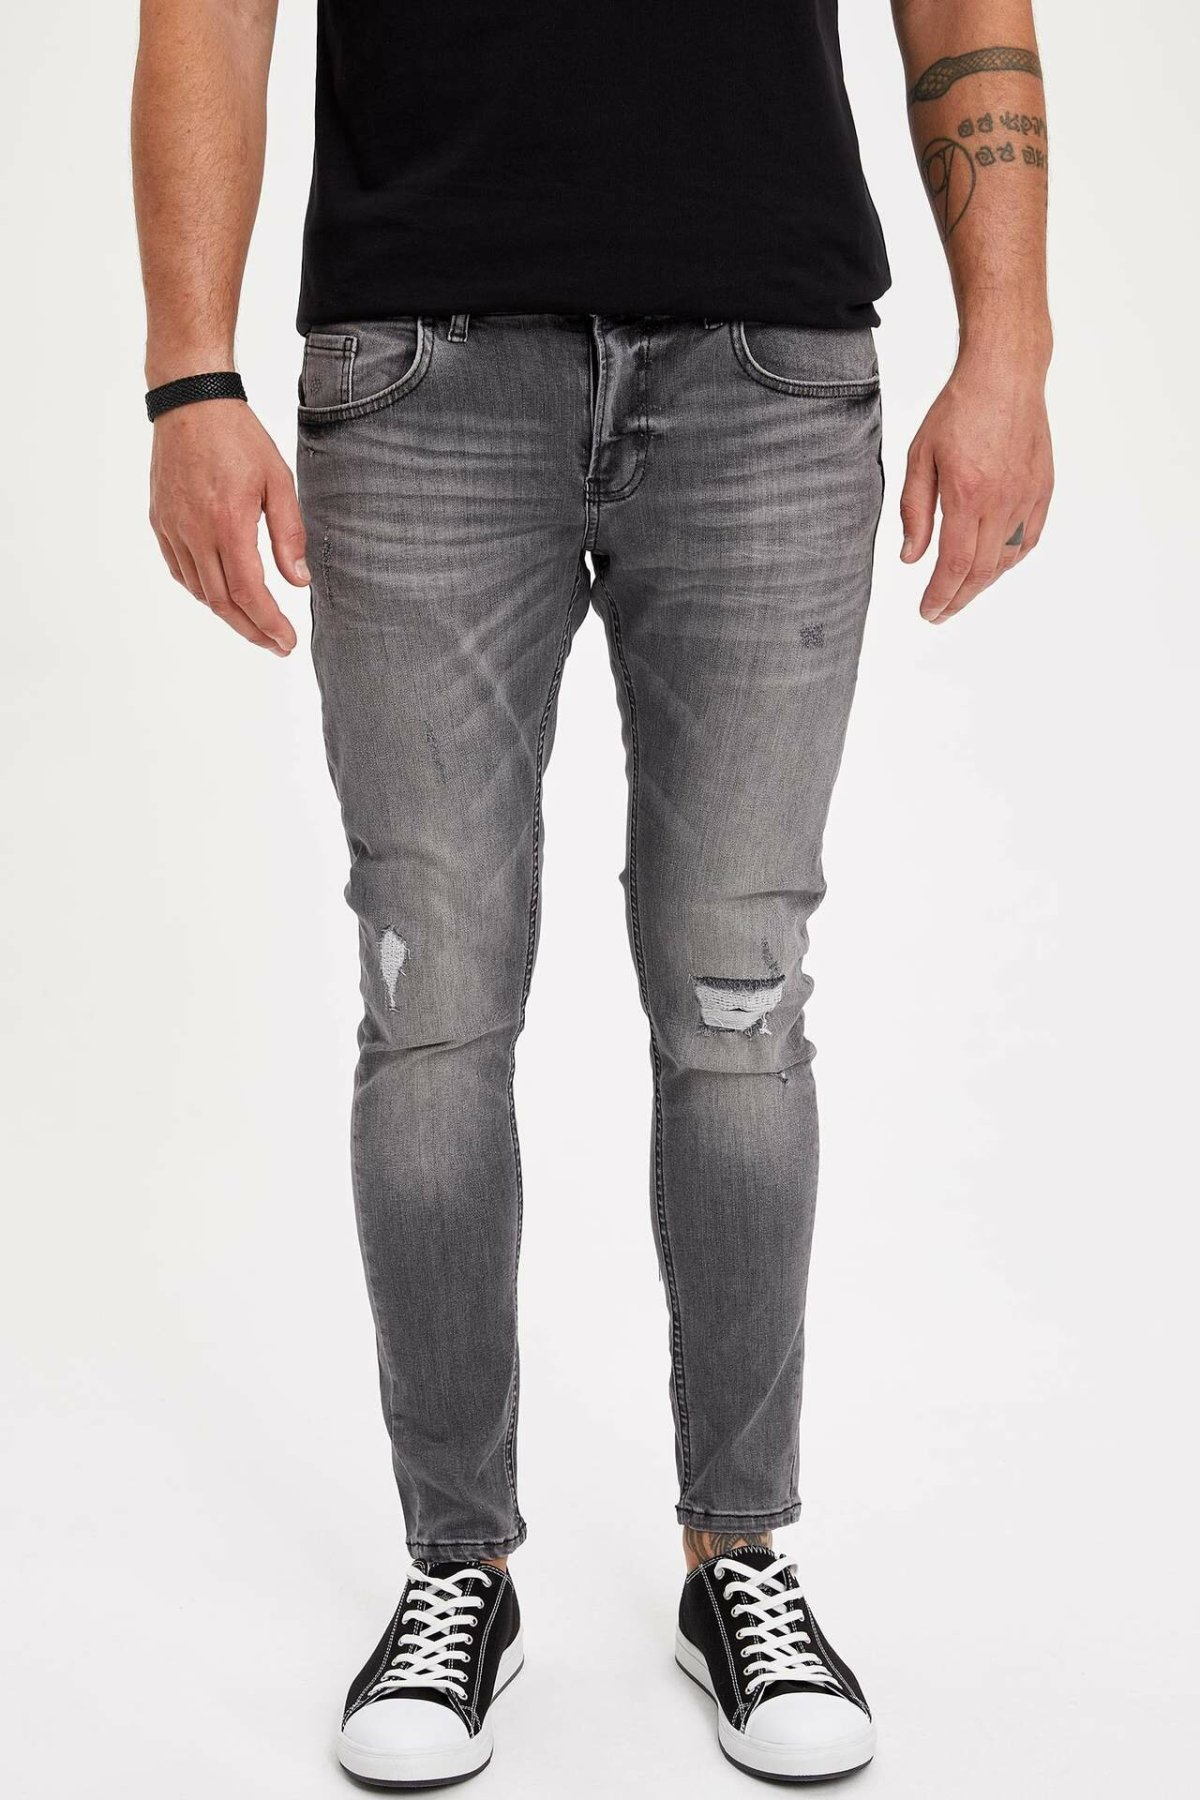 DeFacto Man Fashion Worn Gray Simple Trousers Jeans Casual Classic Slim Denim Jeans Casual Elasticity Pants Male -M0324AZ19SM